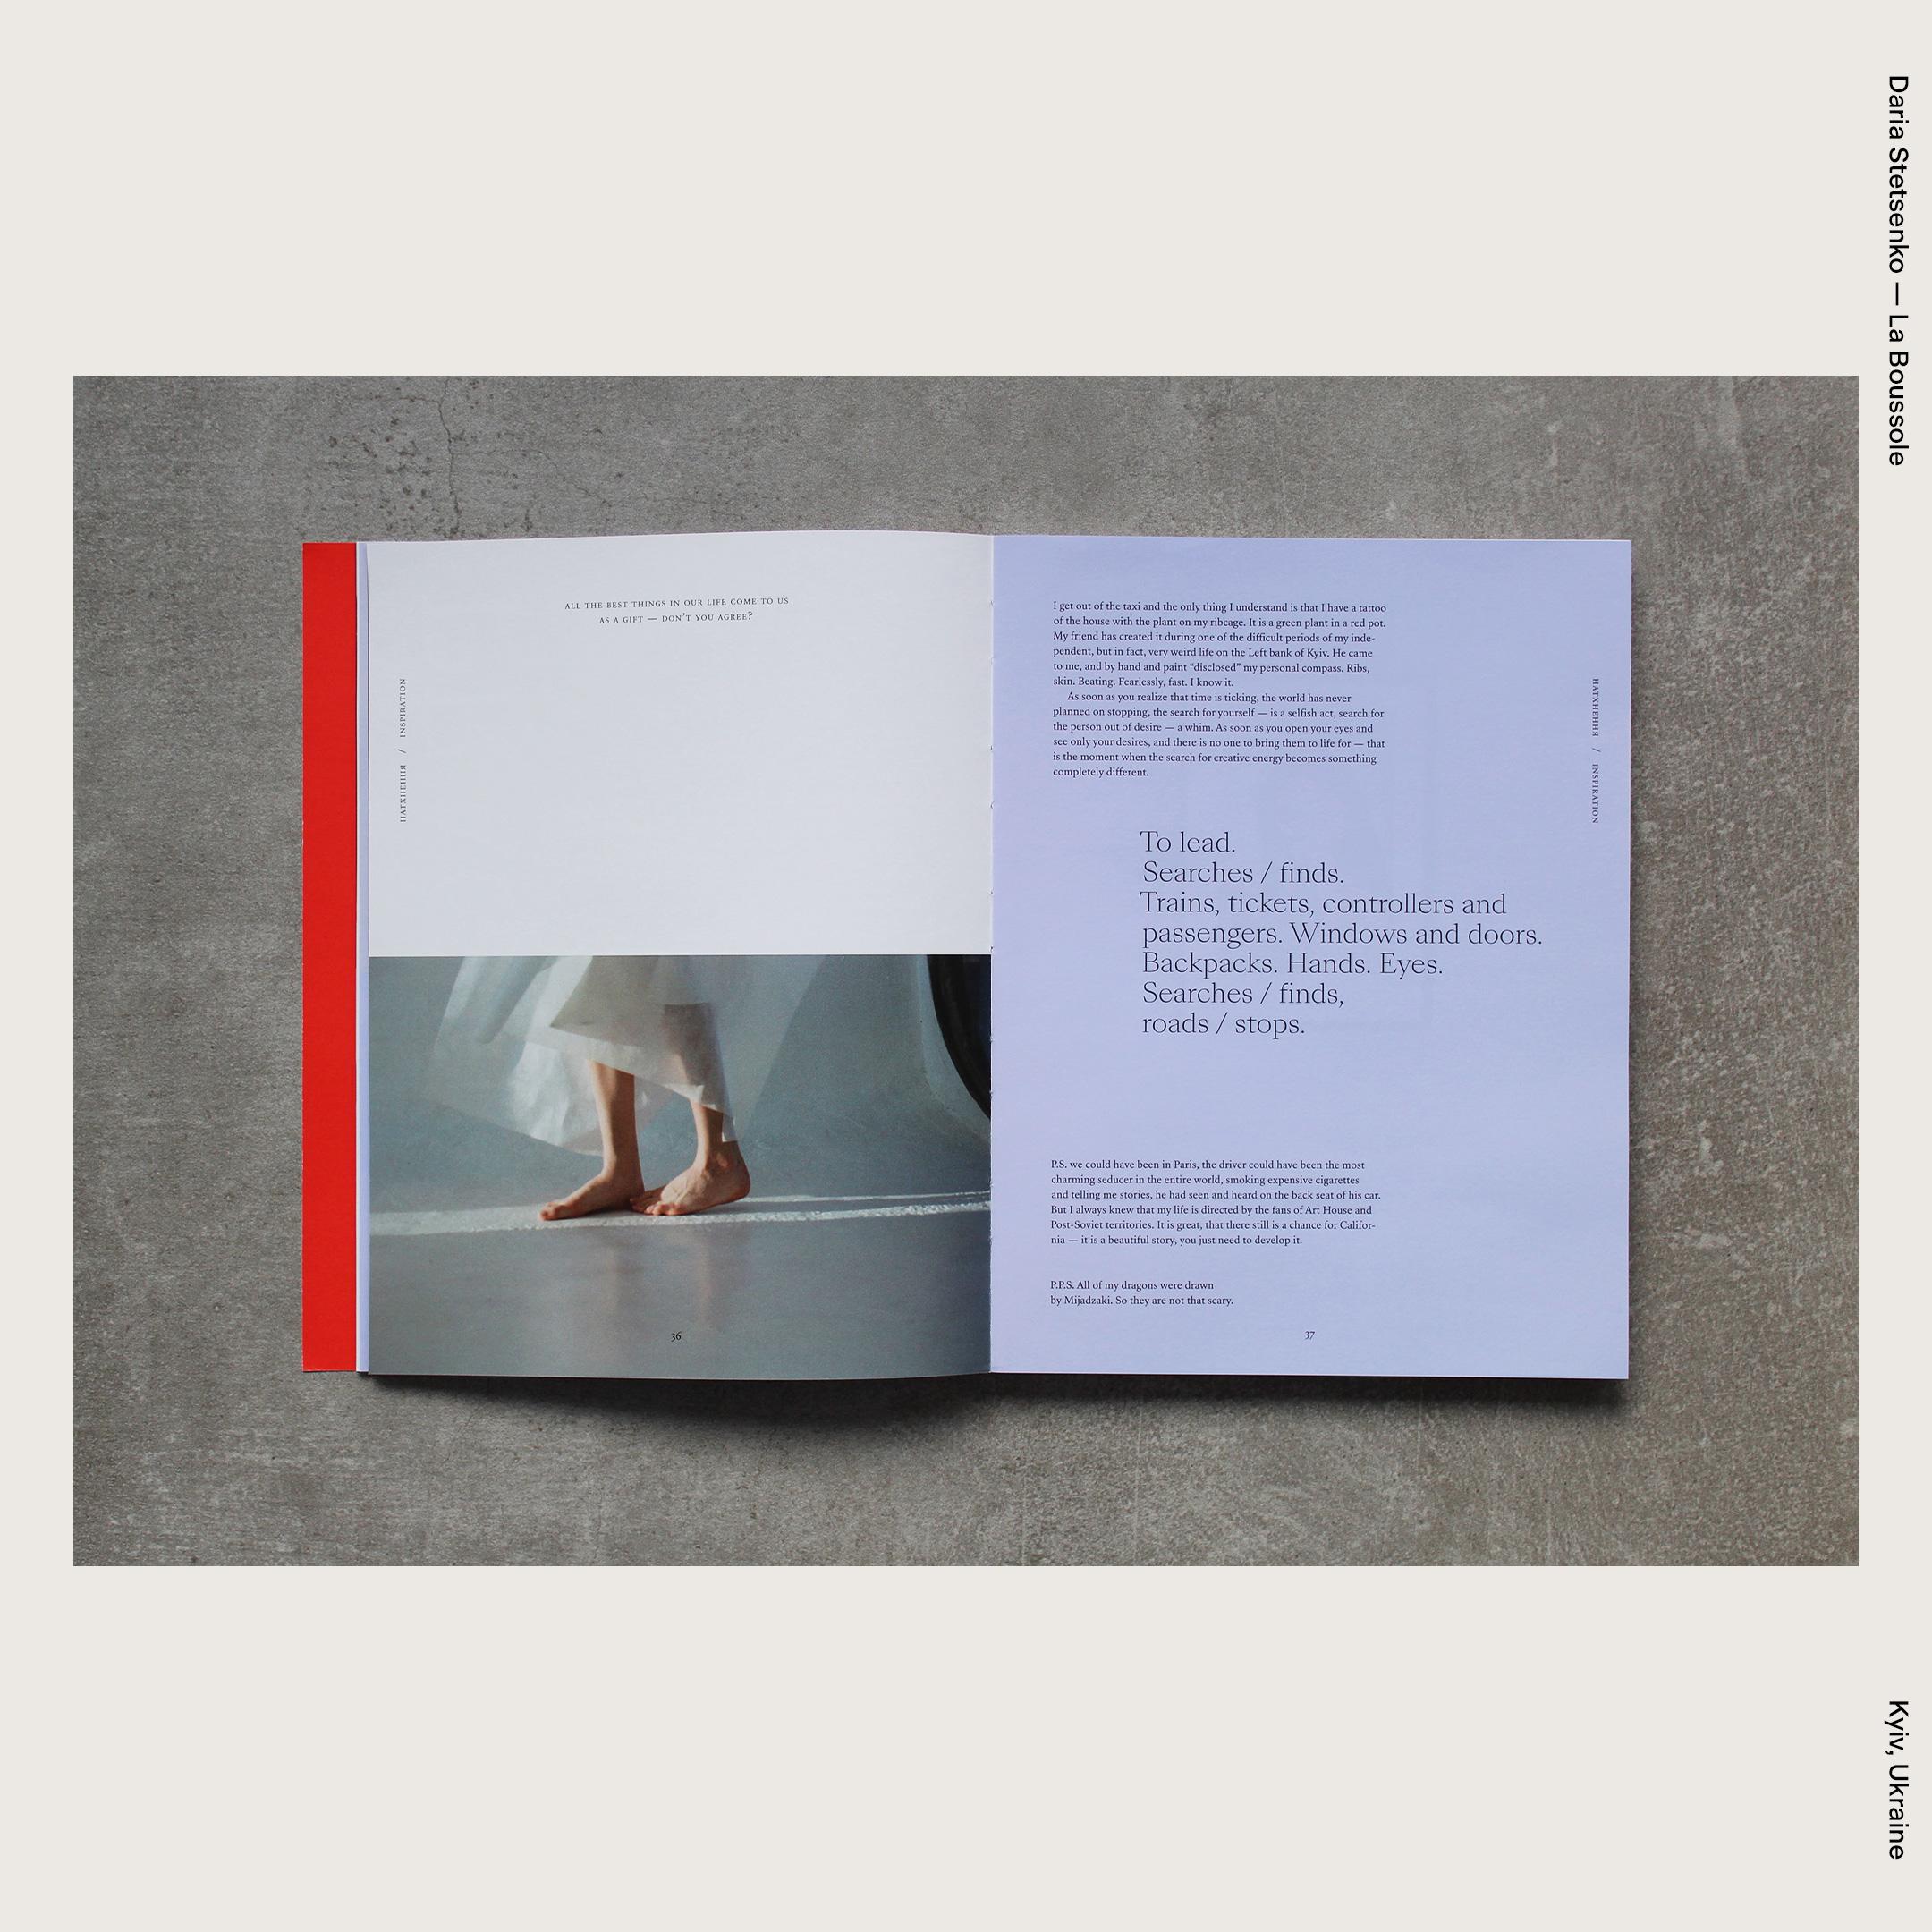 Daria Stetsenko — La Boussole